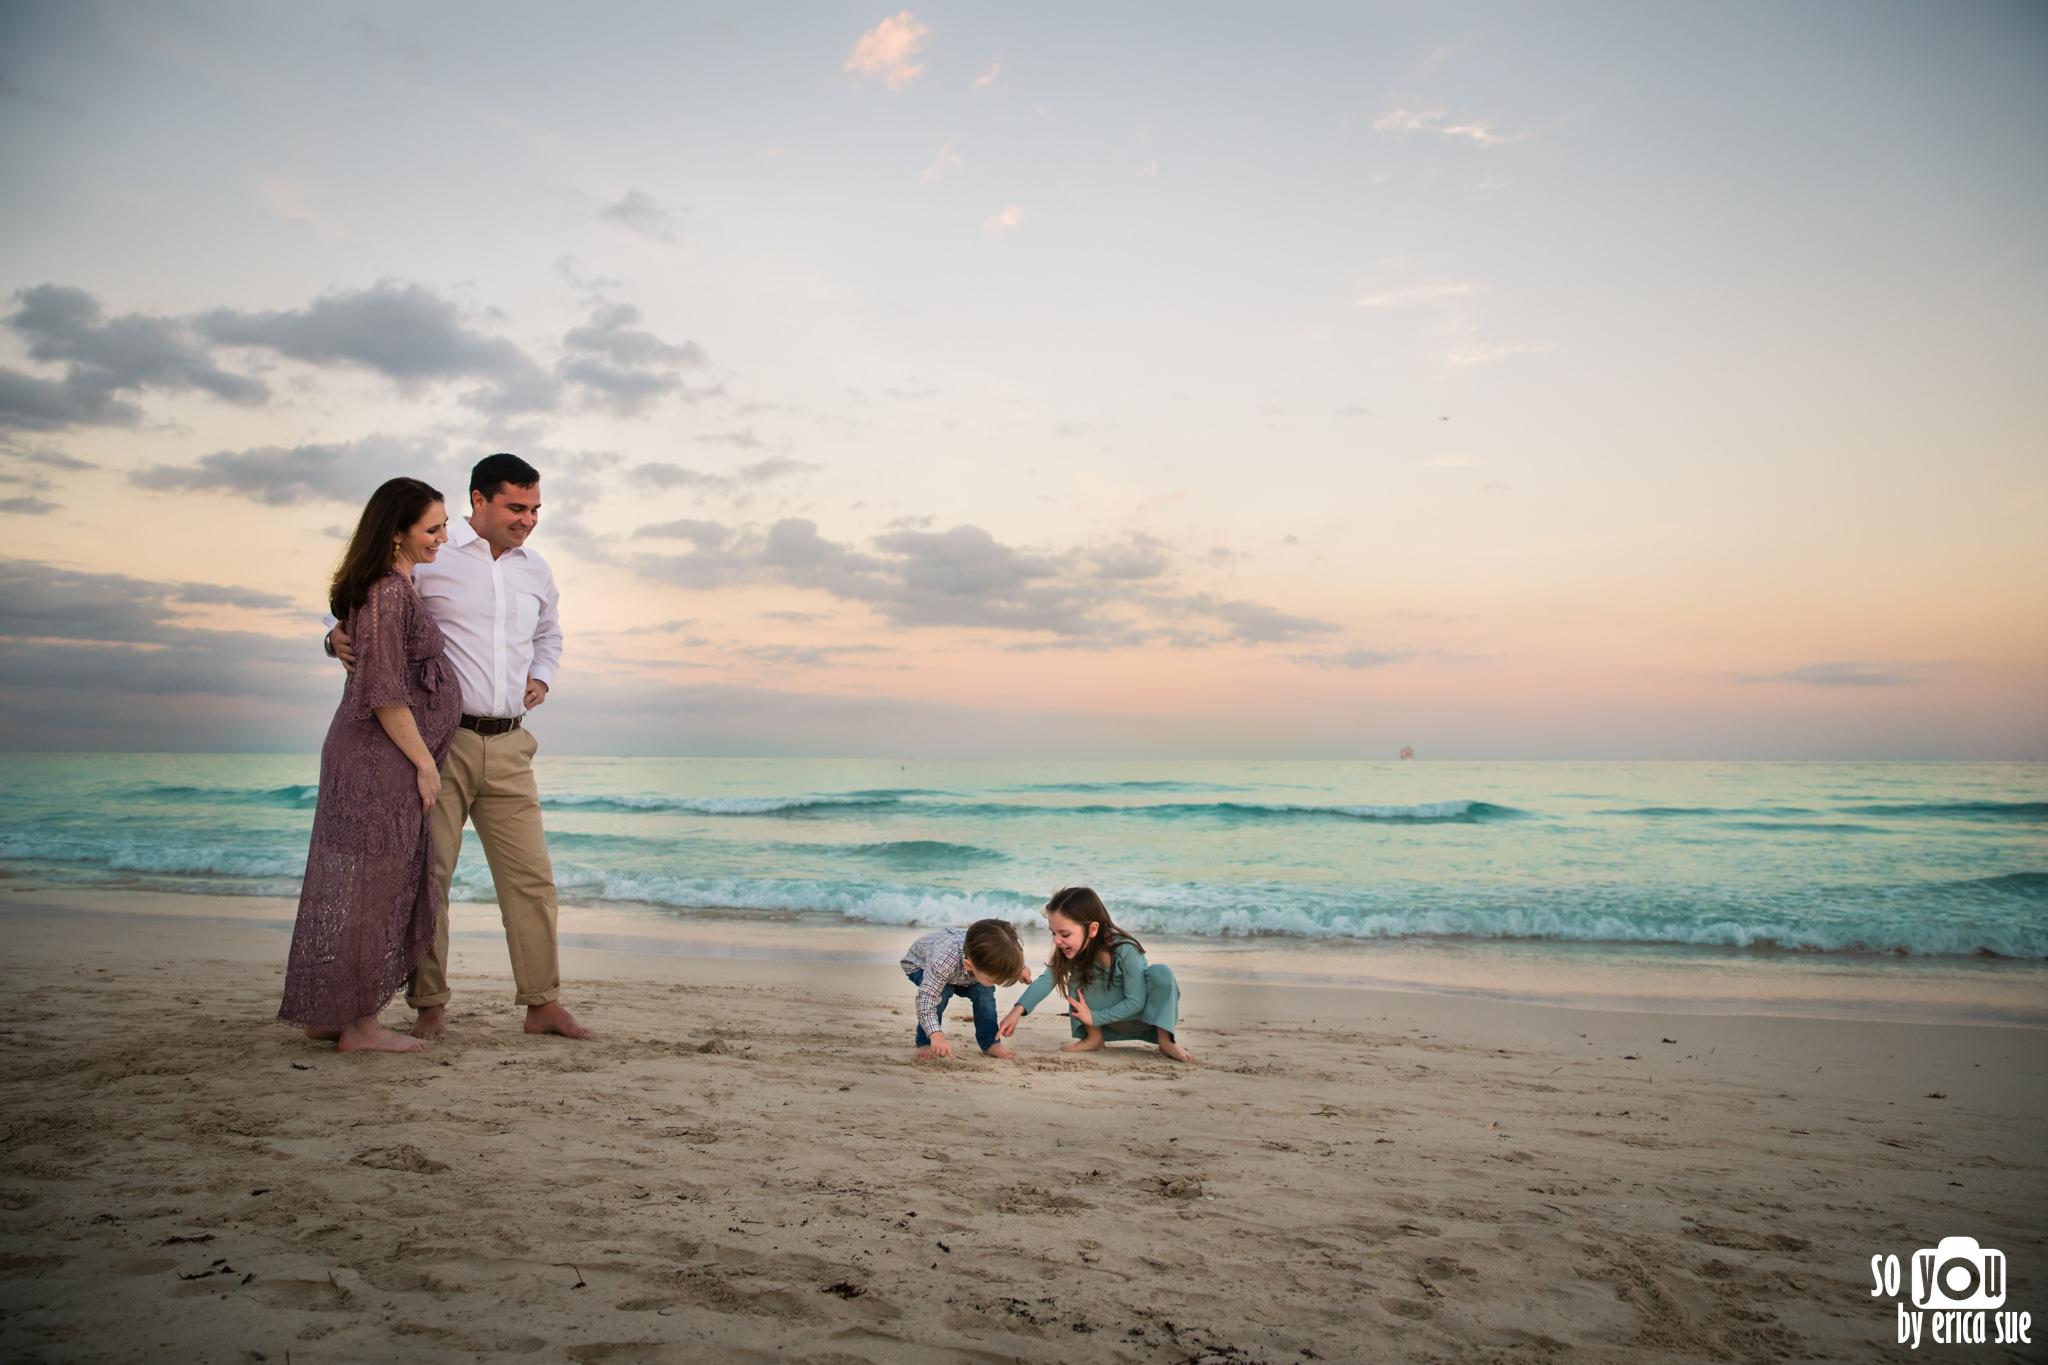 so-you-by-erica-sue-miami-maternity-photographer-south-pointe-park-9509.jpg